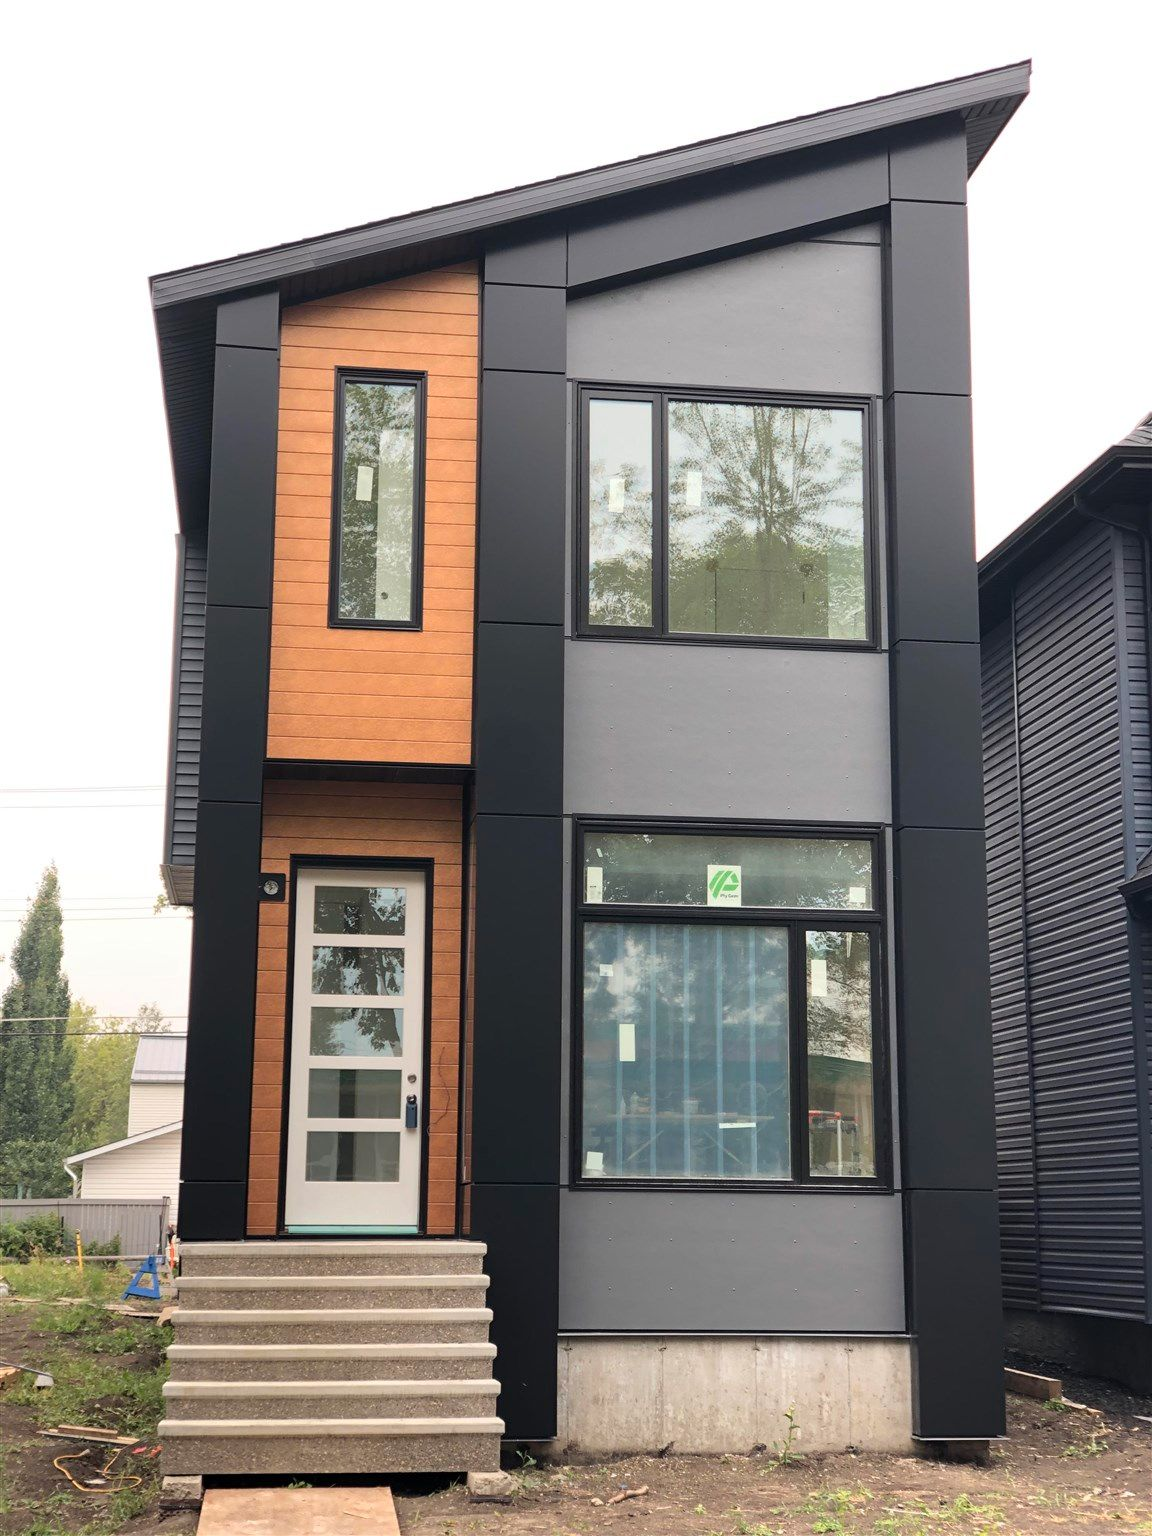 Main Photo: 10904 129 Street in Edmonton: Zone 07 House for sale : MLS®# E4255151